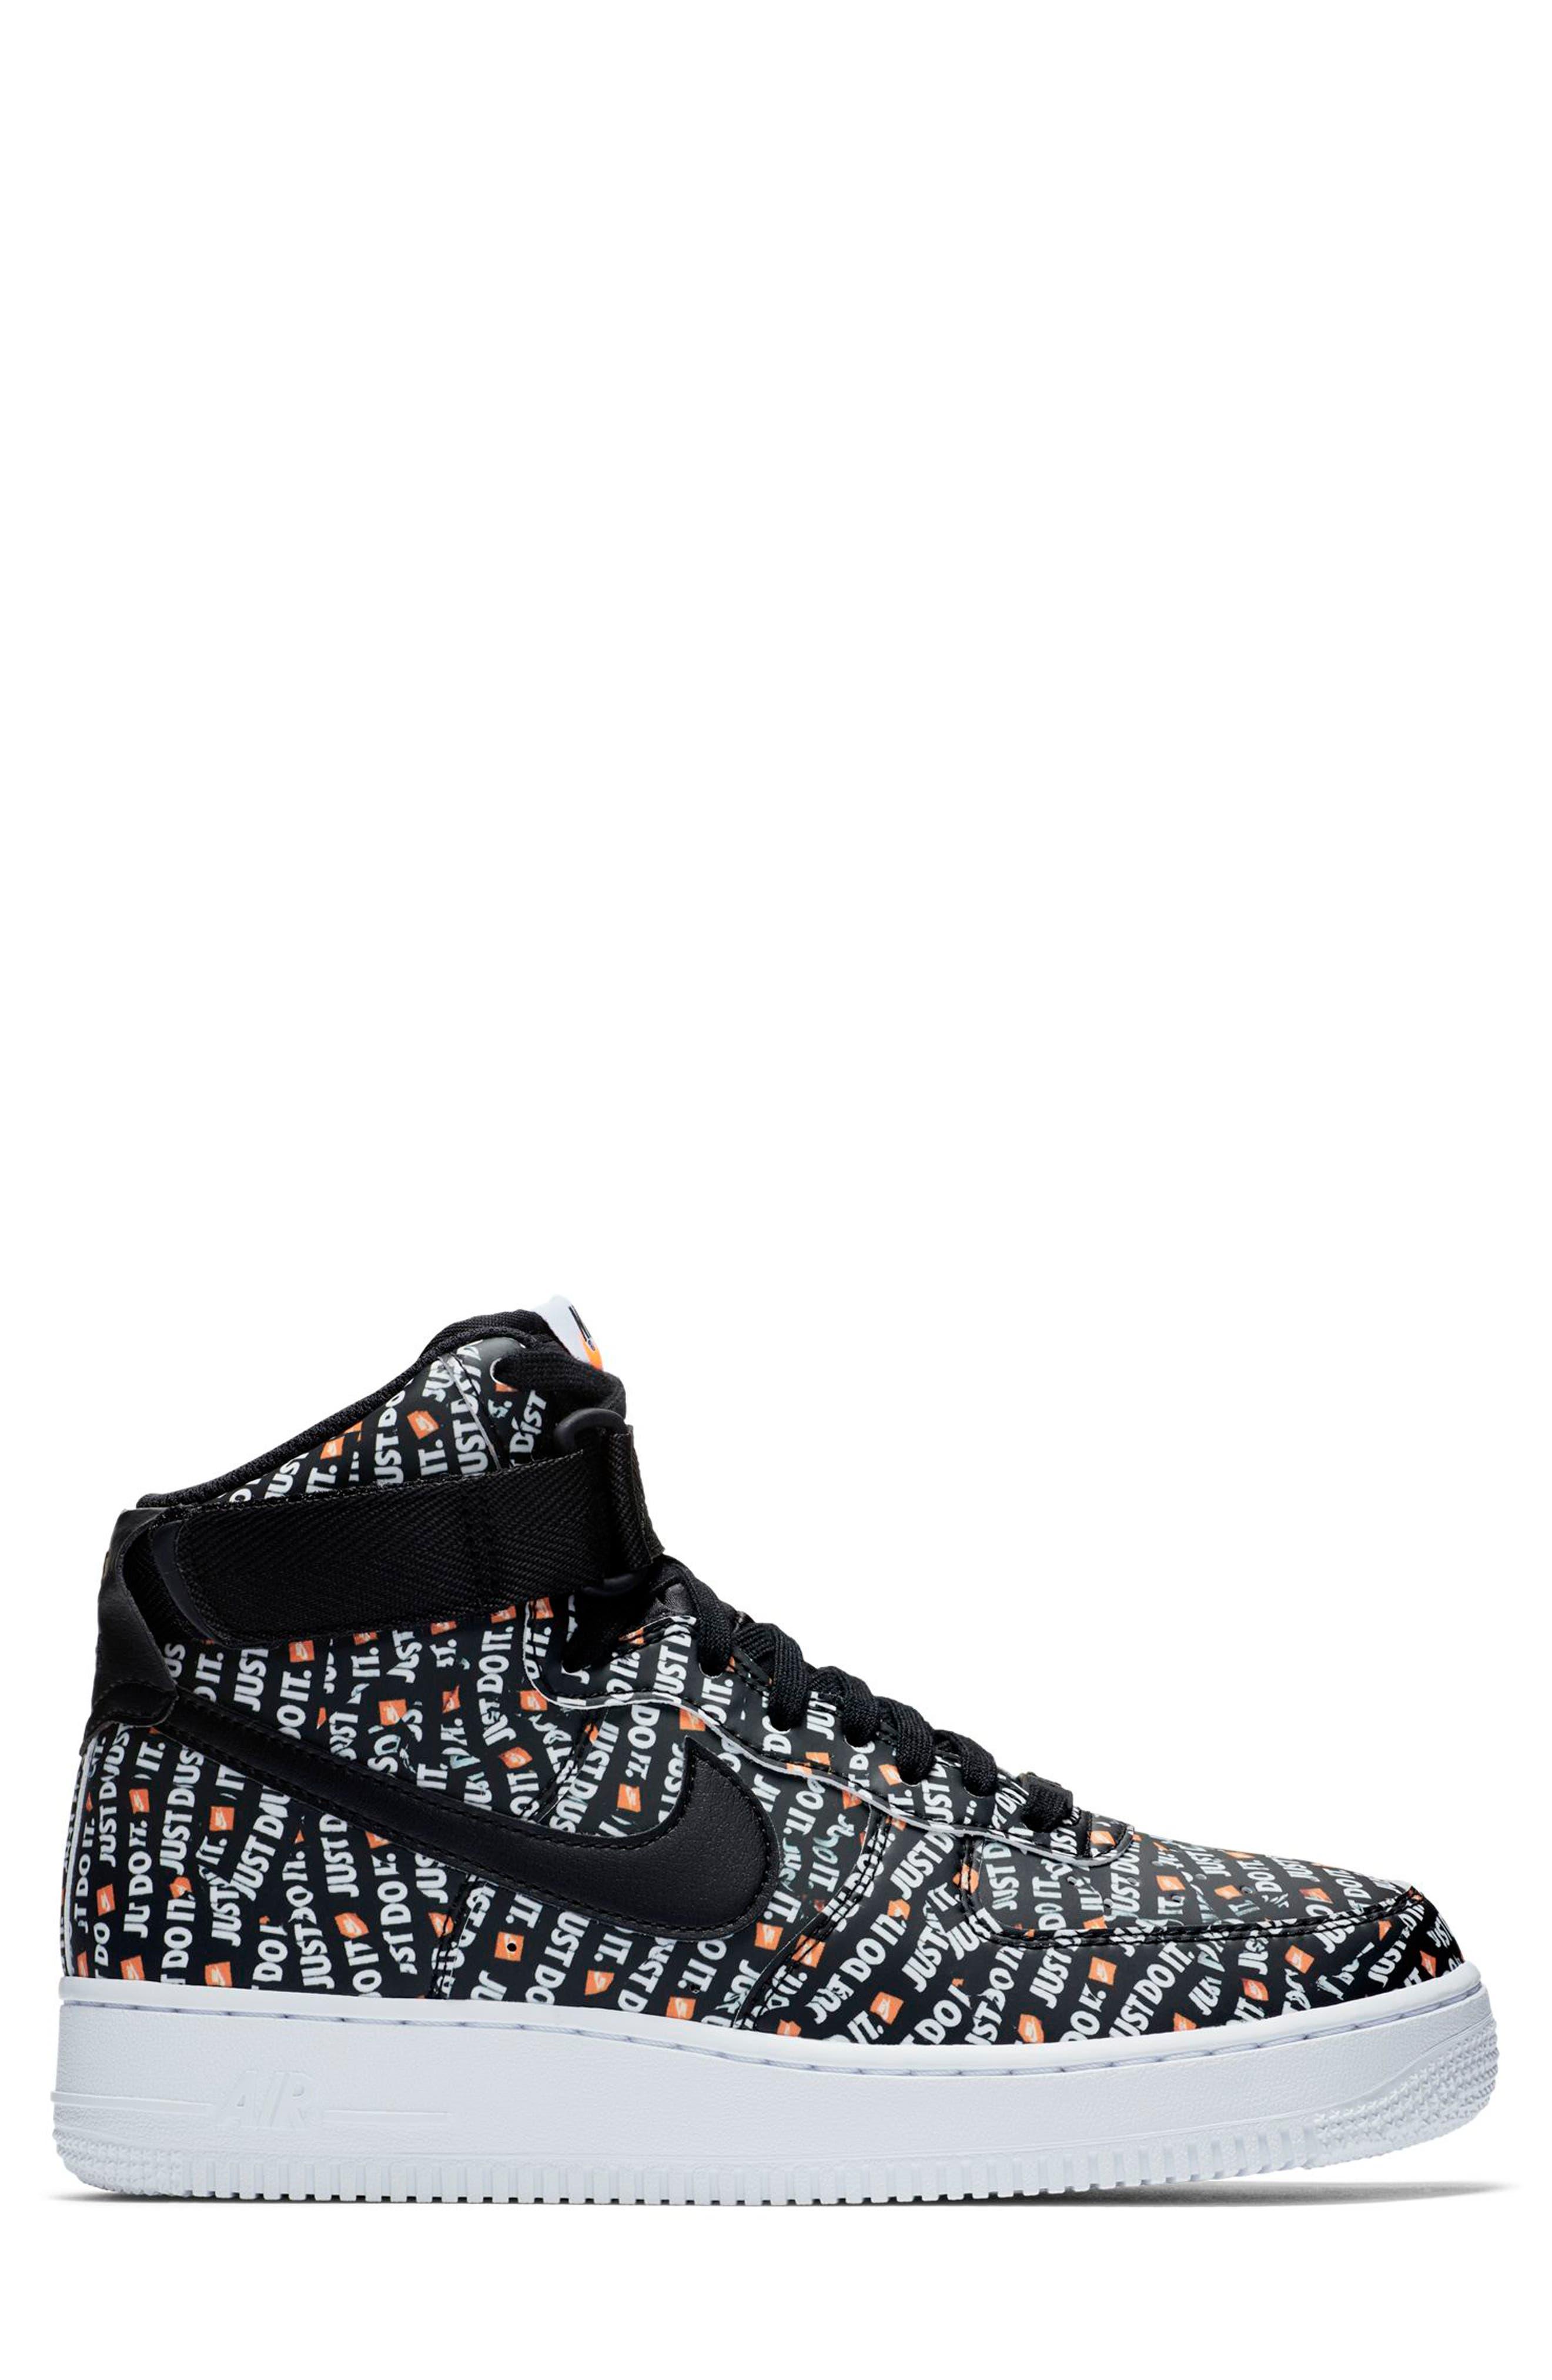 Air Force 1 High LX High Top Sneaker,                             Alternate thumbnail 3, color,                             BLACK